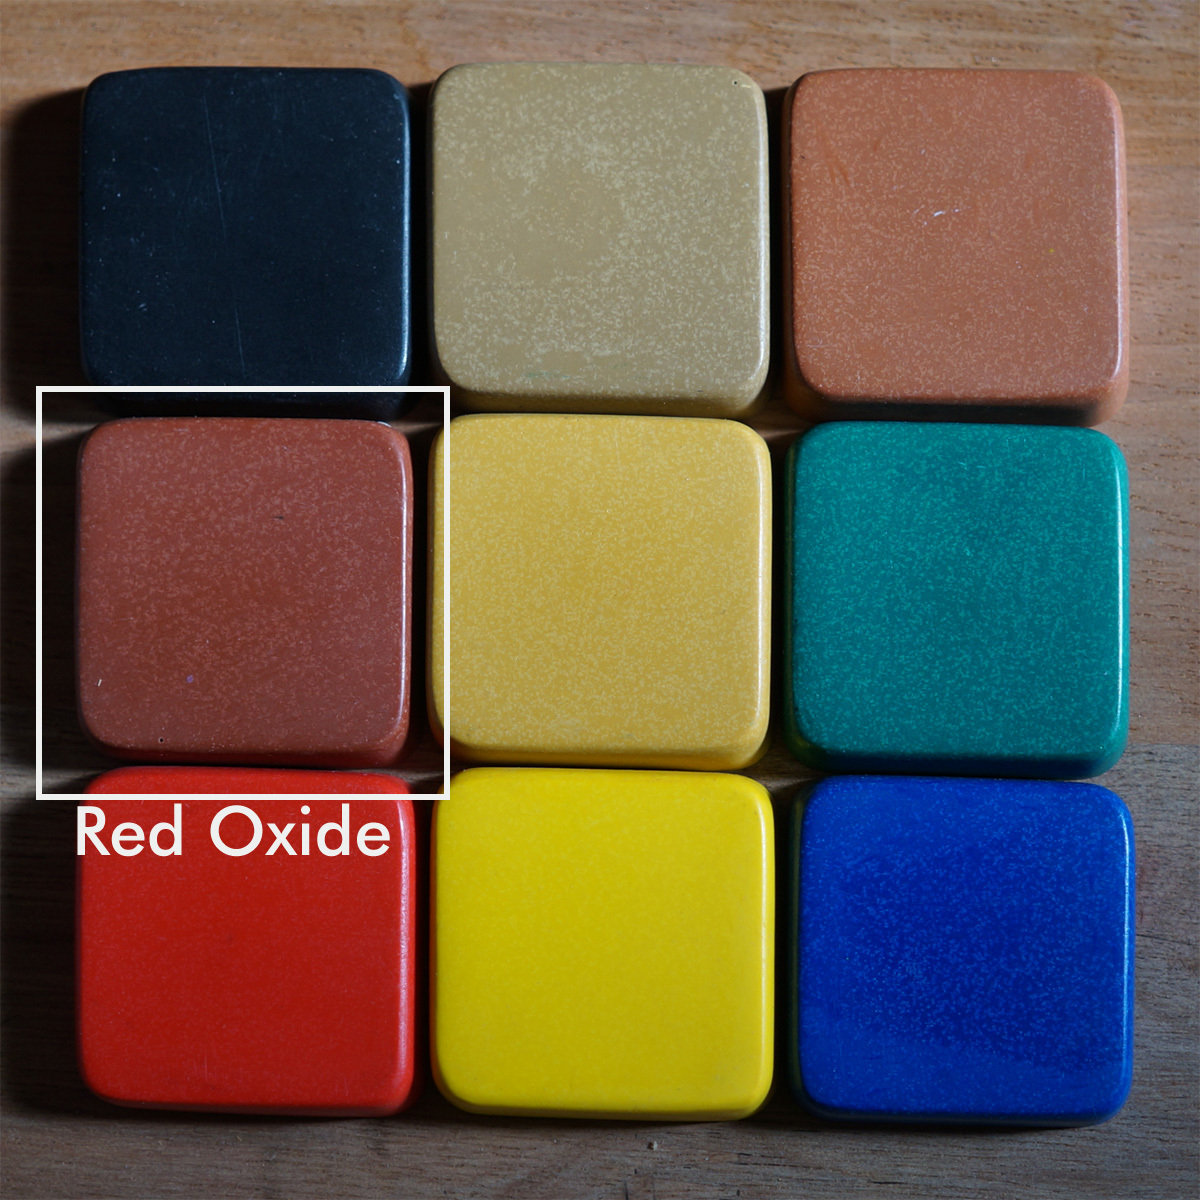 PIGMENT RED OXIDE 200g(着色剤:レッドオキサイド 200g) - 画像2